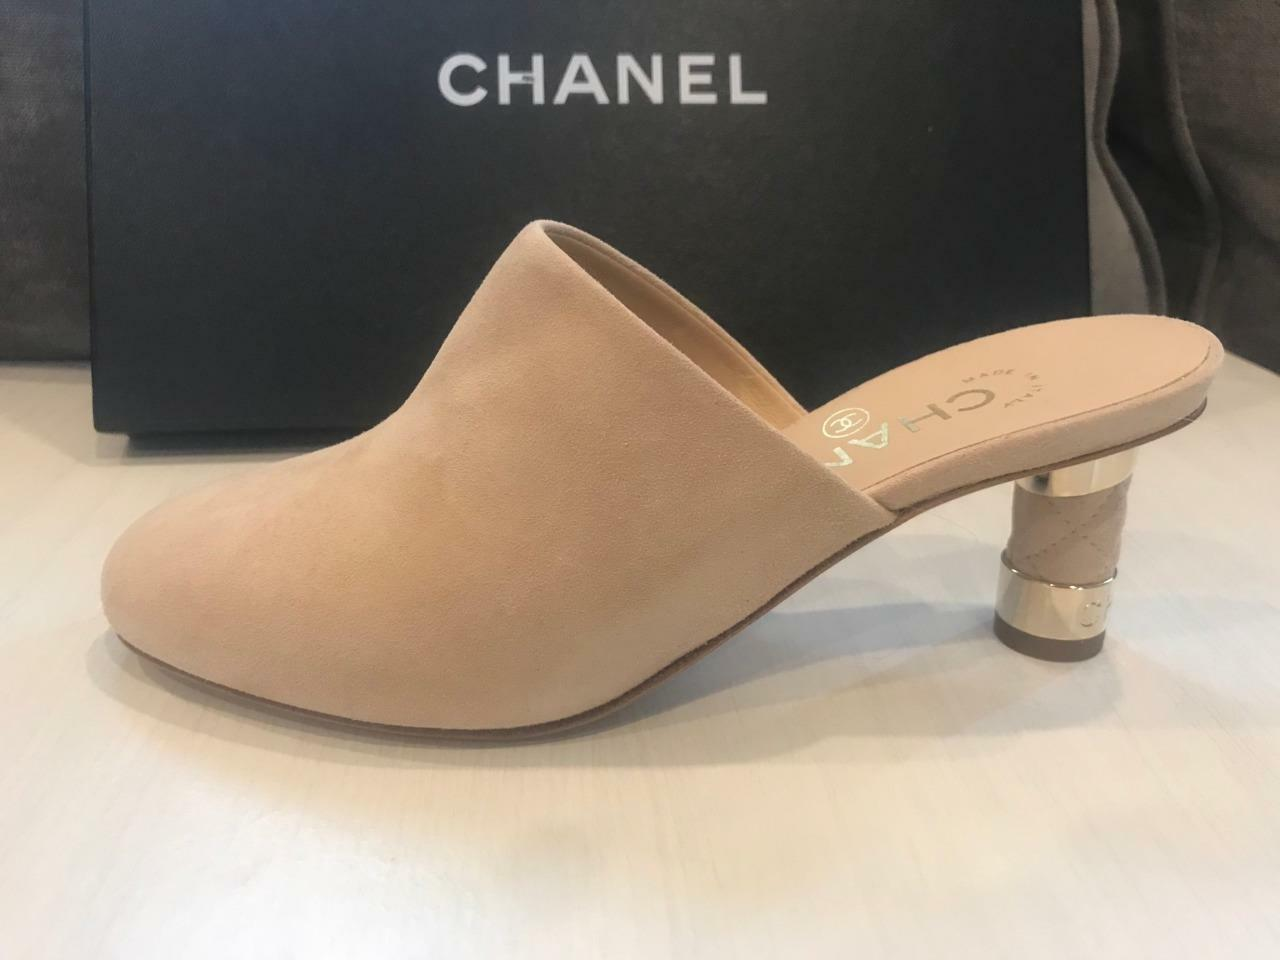 CHANAEL 18P Suede Quilted Heel Mules Sandals Slides scarpe  Beige  1125  centro commerciale di moda